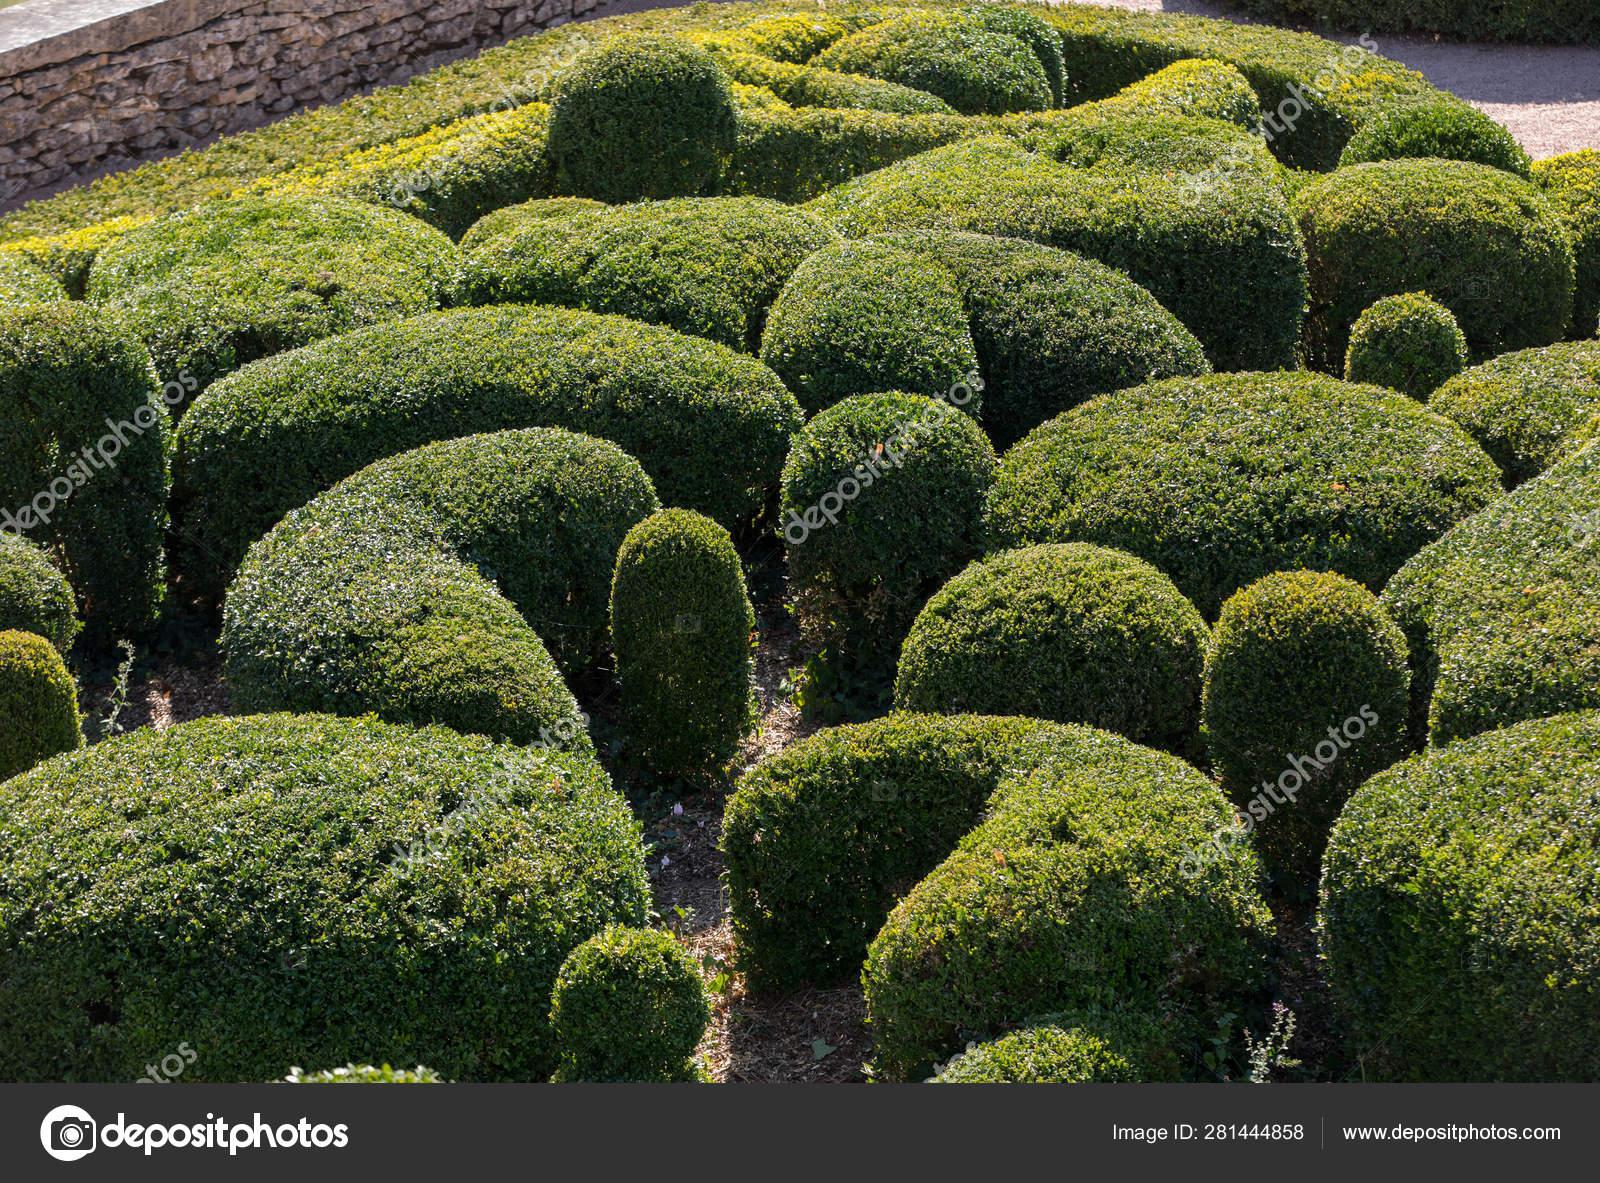 depositphotos stock photo topiary gardens jardins marqueyssac dordogne